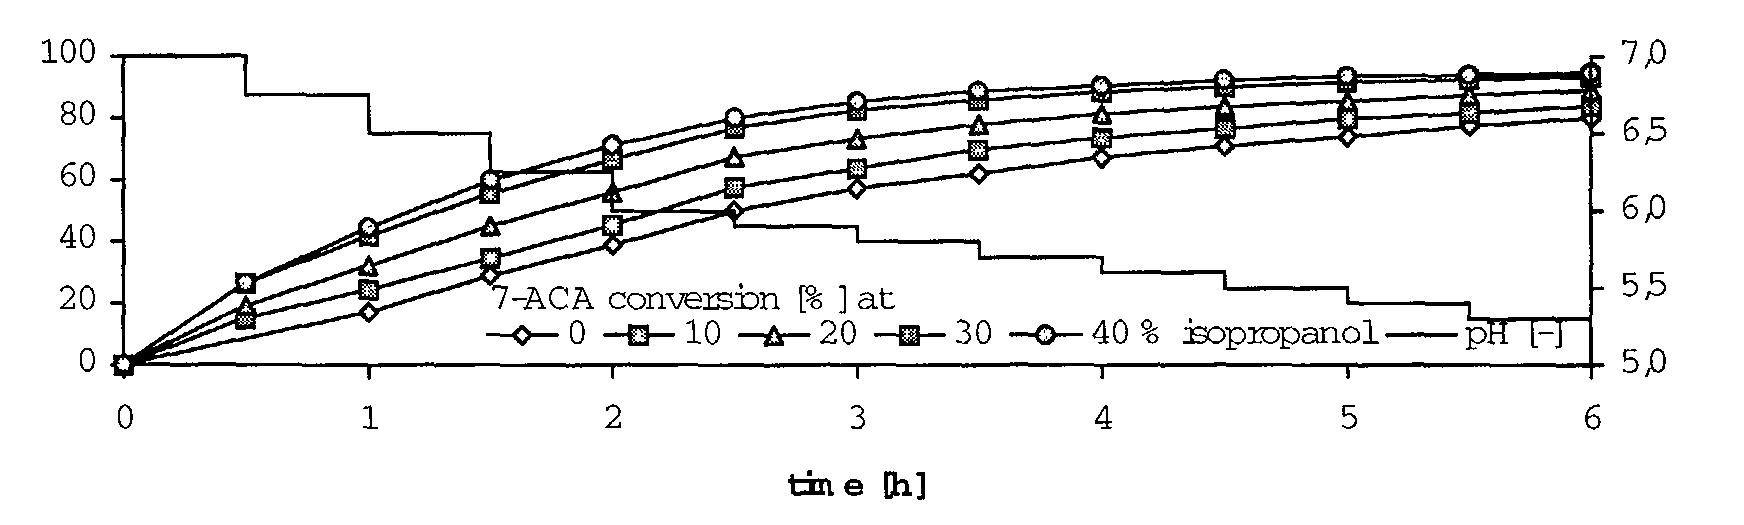 EP1394262A1 - An enzymatic process for preparing beta-lactams